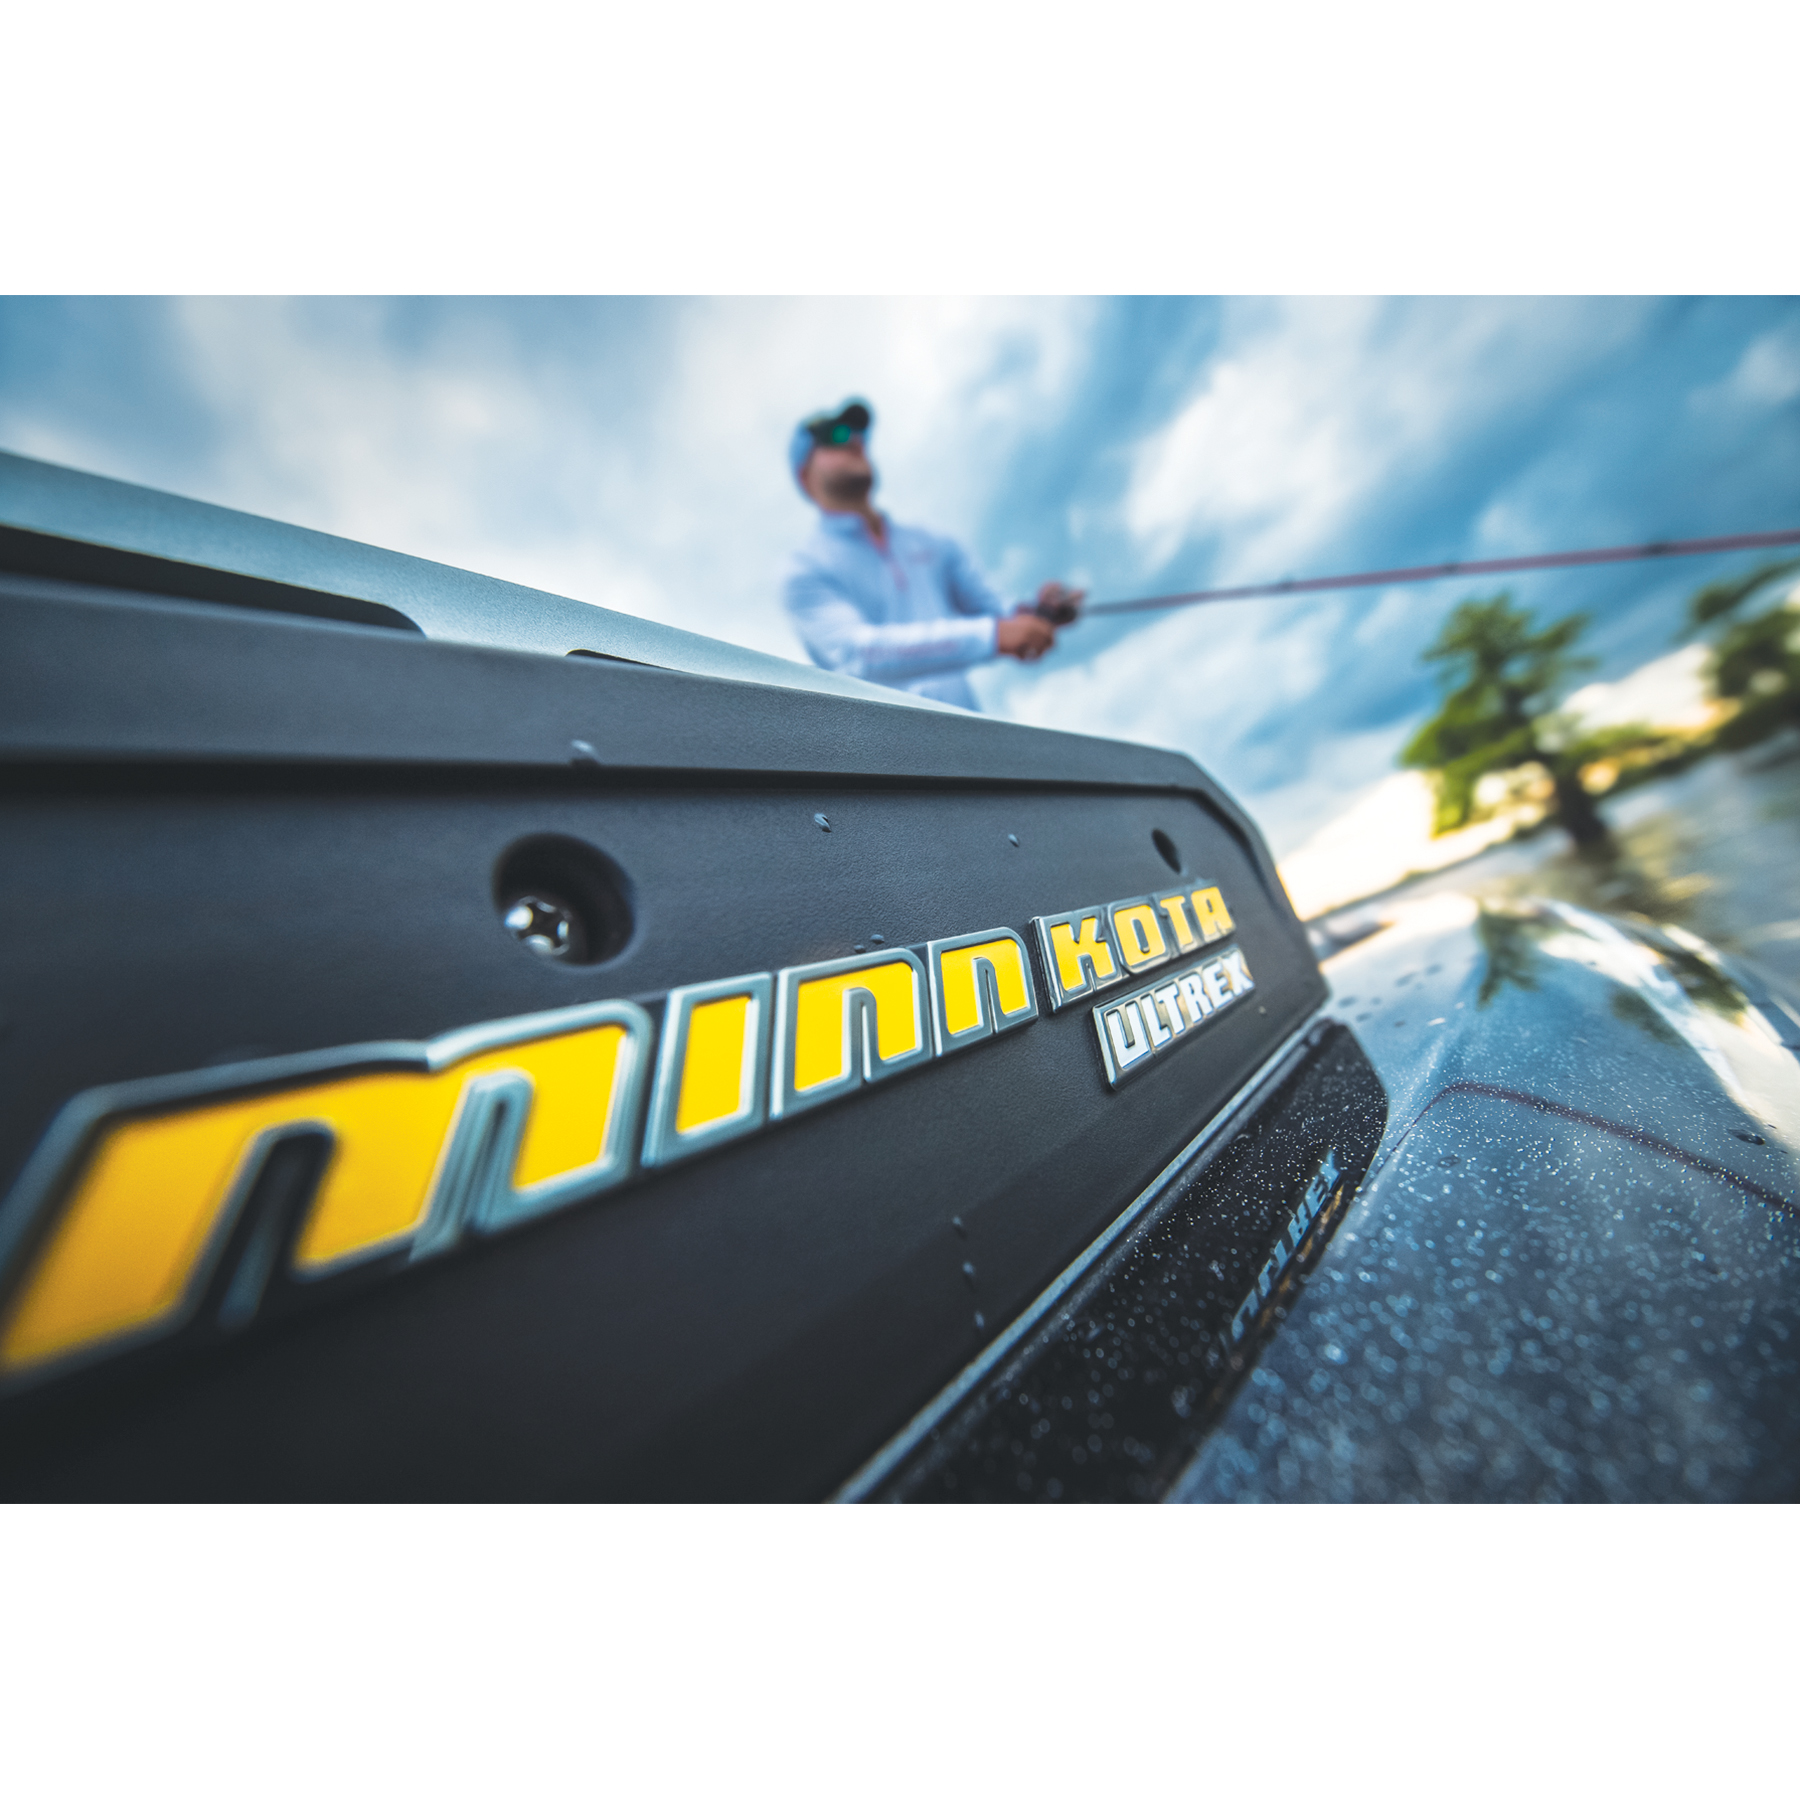 Minn Kota Ultrex i-Pilot Freshwater Bow-Mount Trolling Motor w/Bluetooth, US2